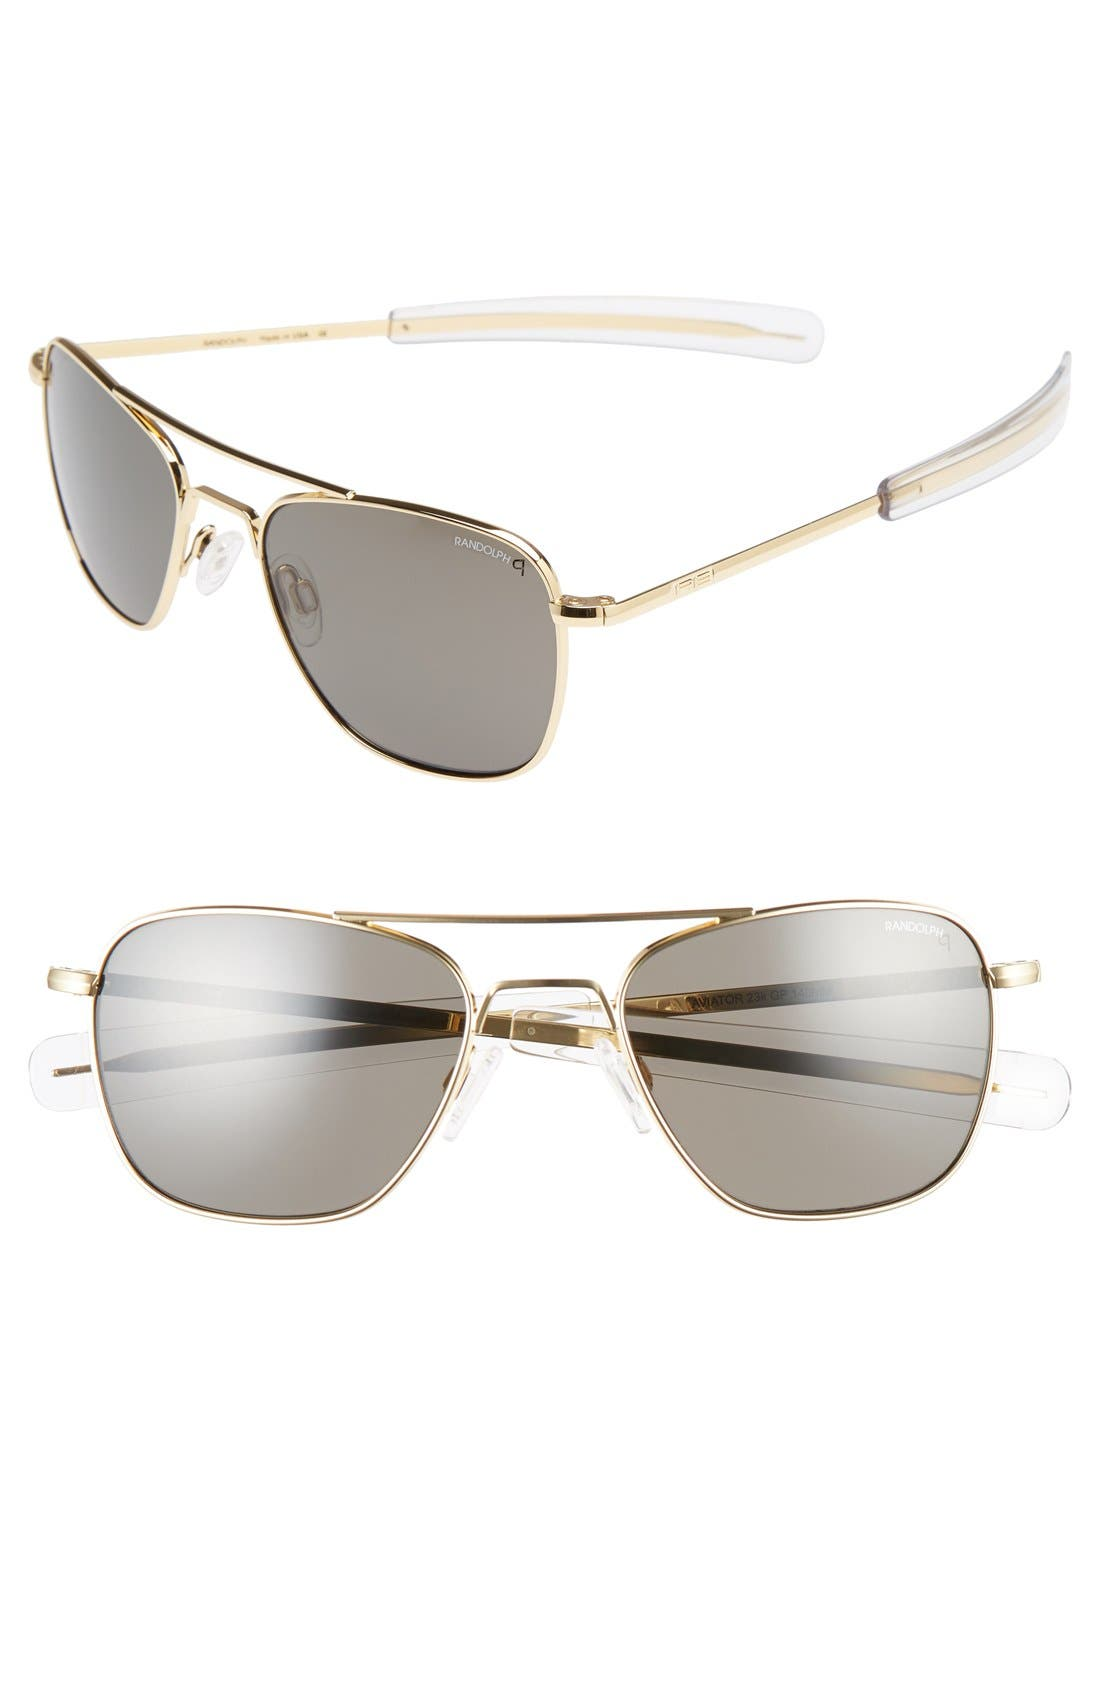 52mm Polarized Aviator Sunglasses,                             Main thumbnail 1, color,                             711